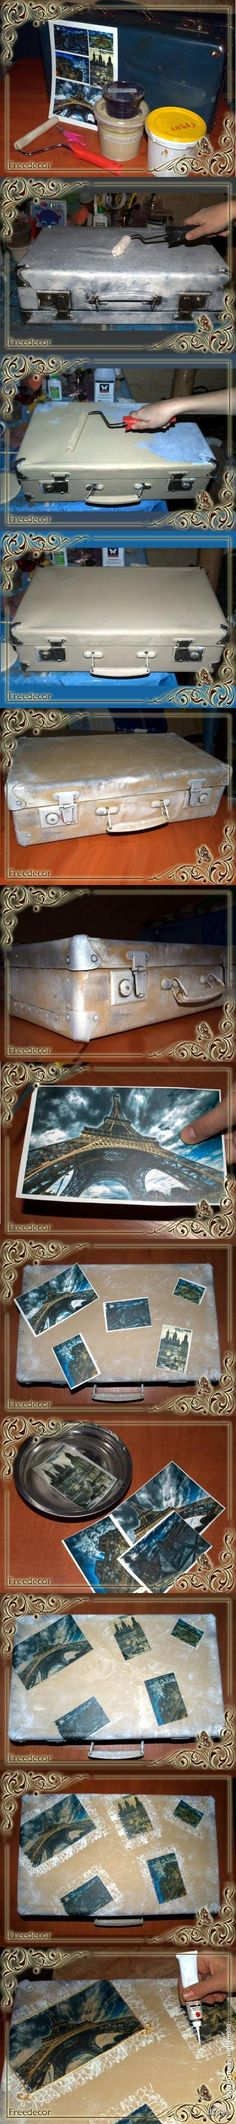 Декупаж - Сайт любителей декупажа - DCPG.RU | Винтажный чемодан